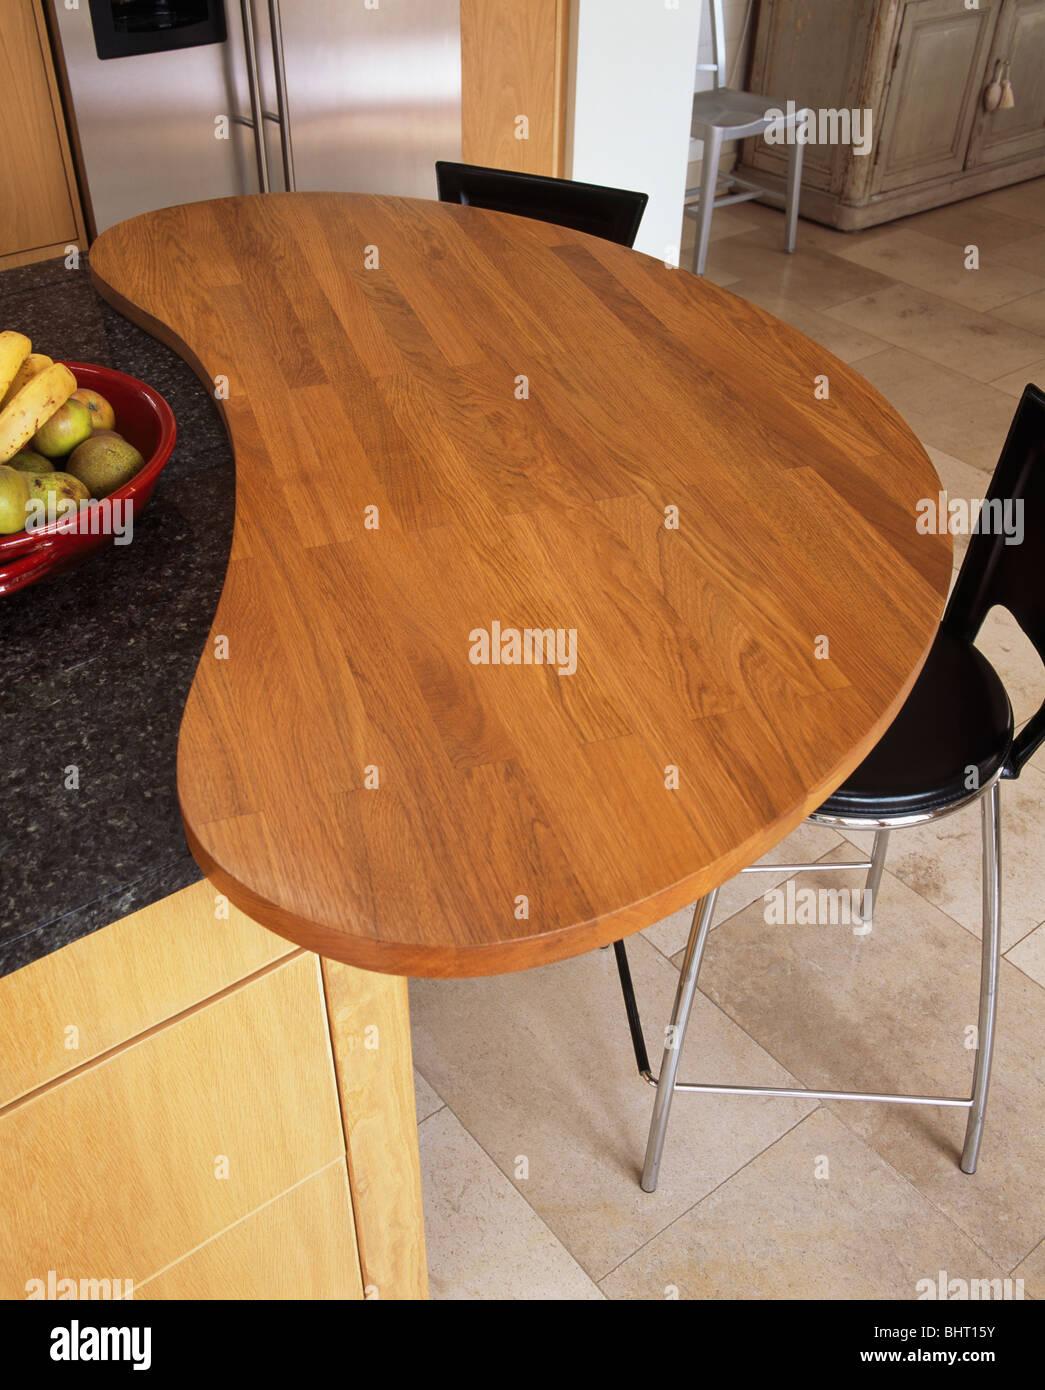 Curved Wood Breakfast Bar On Island Unit In Modern Kitchen